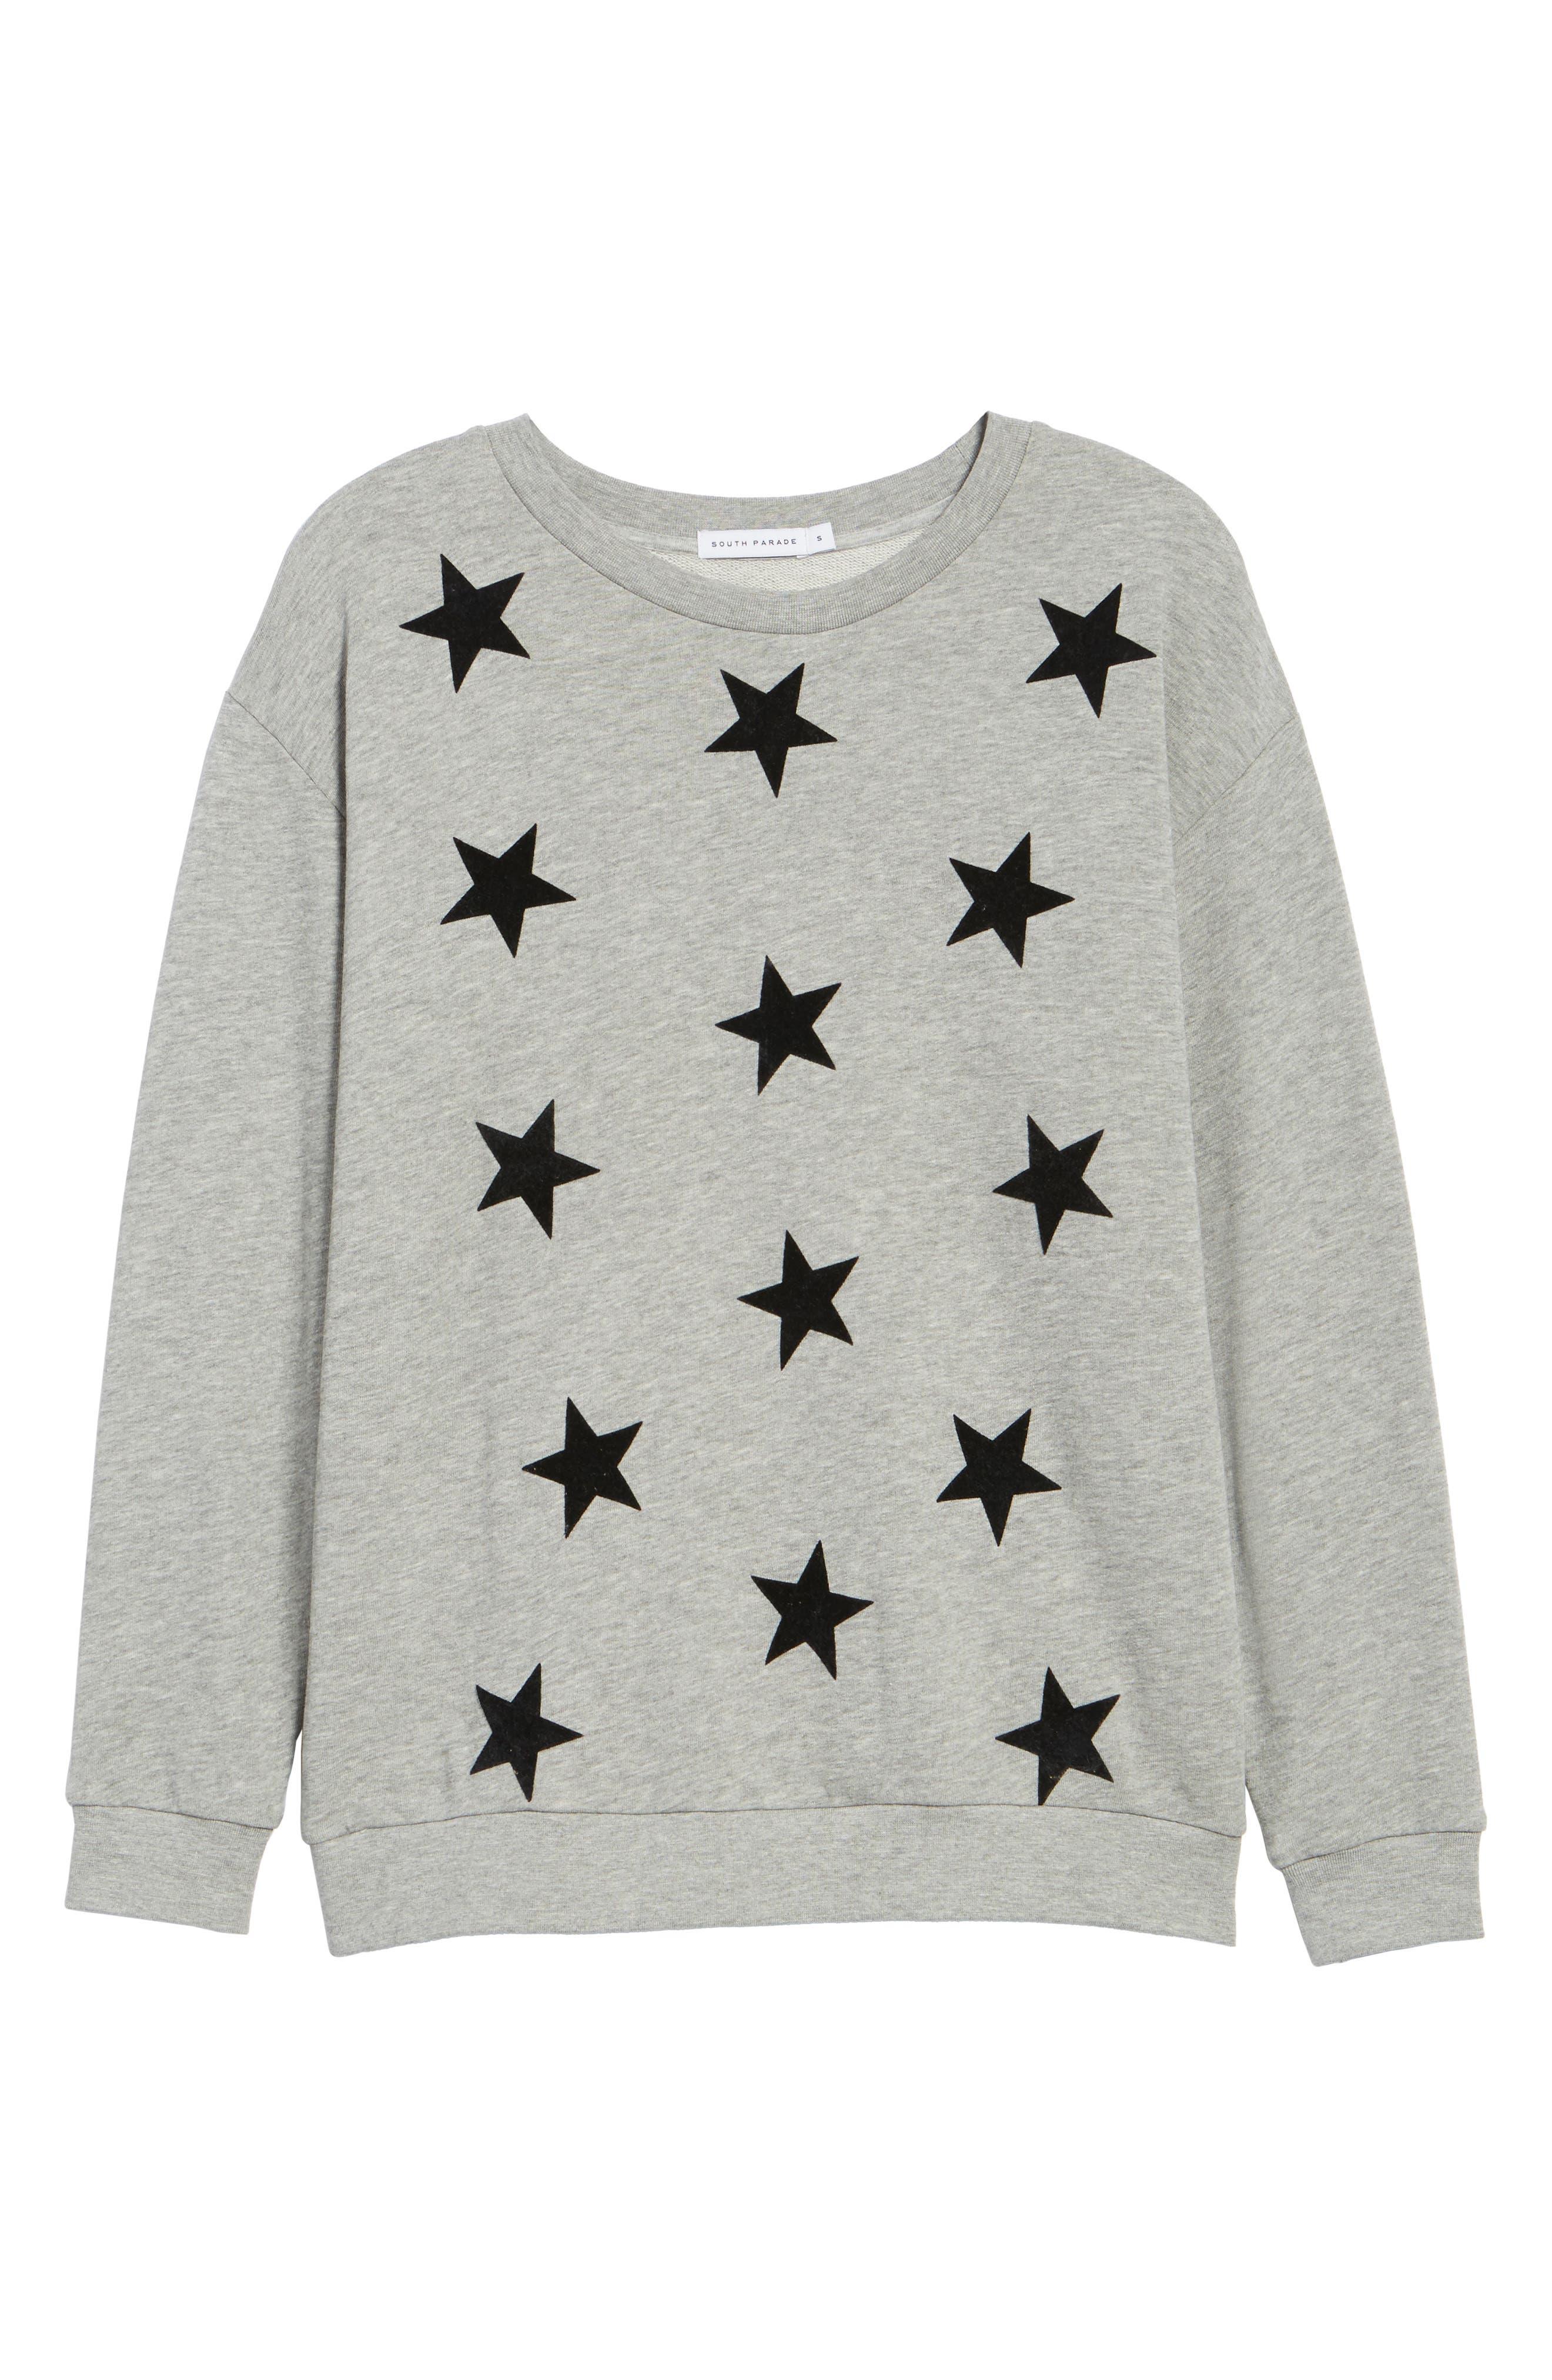 Alexa - Super Stars Sweatshirt,                             Alternate thumbnail 6, color,                             020